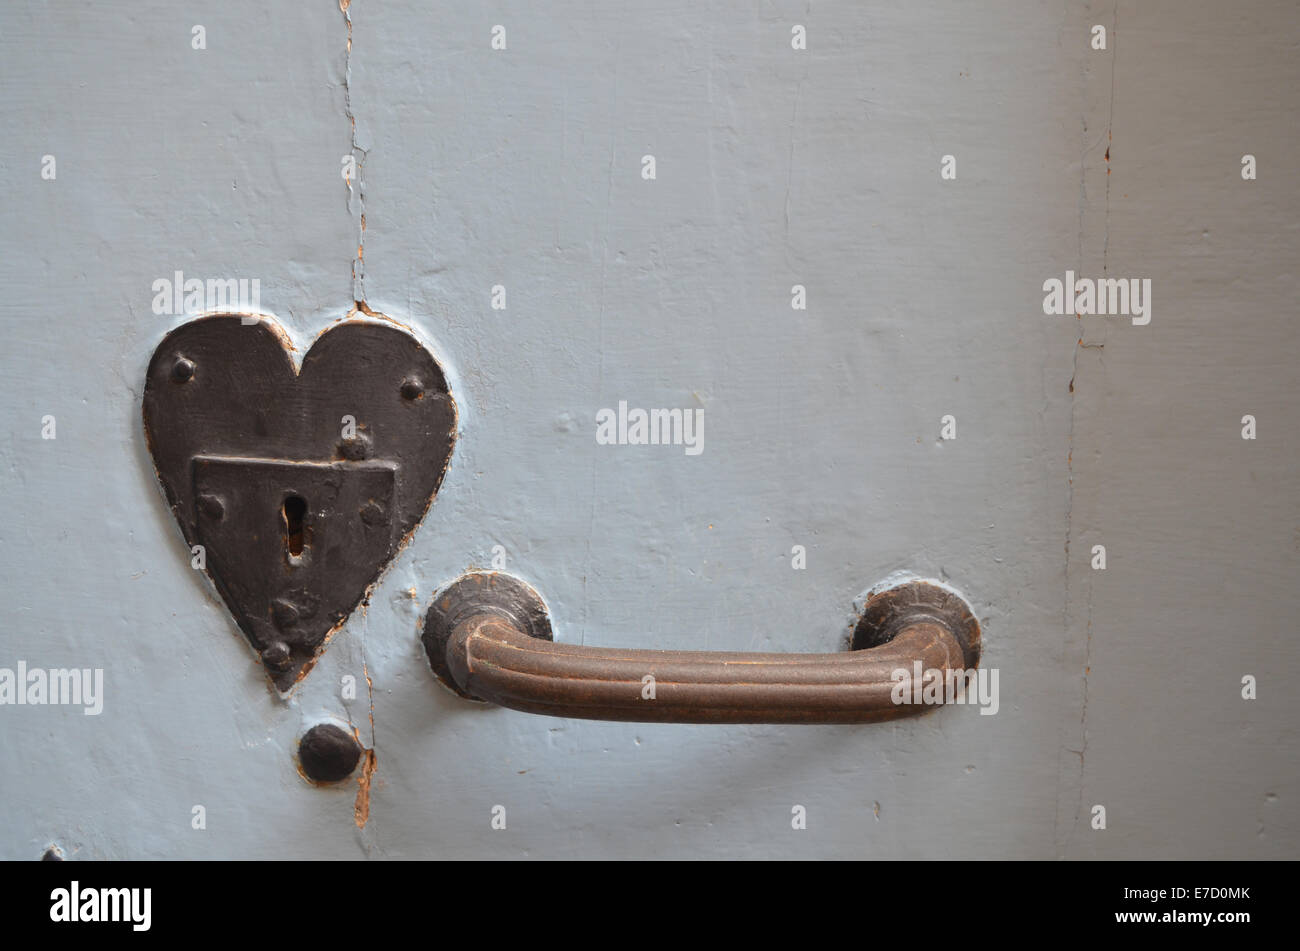 Heart shaped lock, France - Stock Image